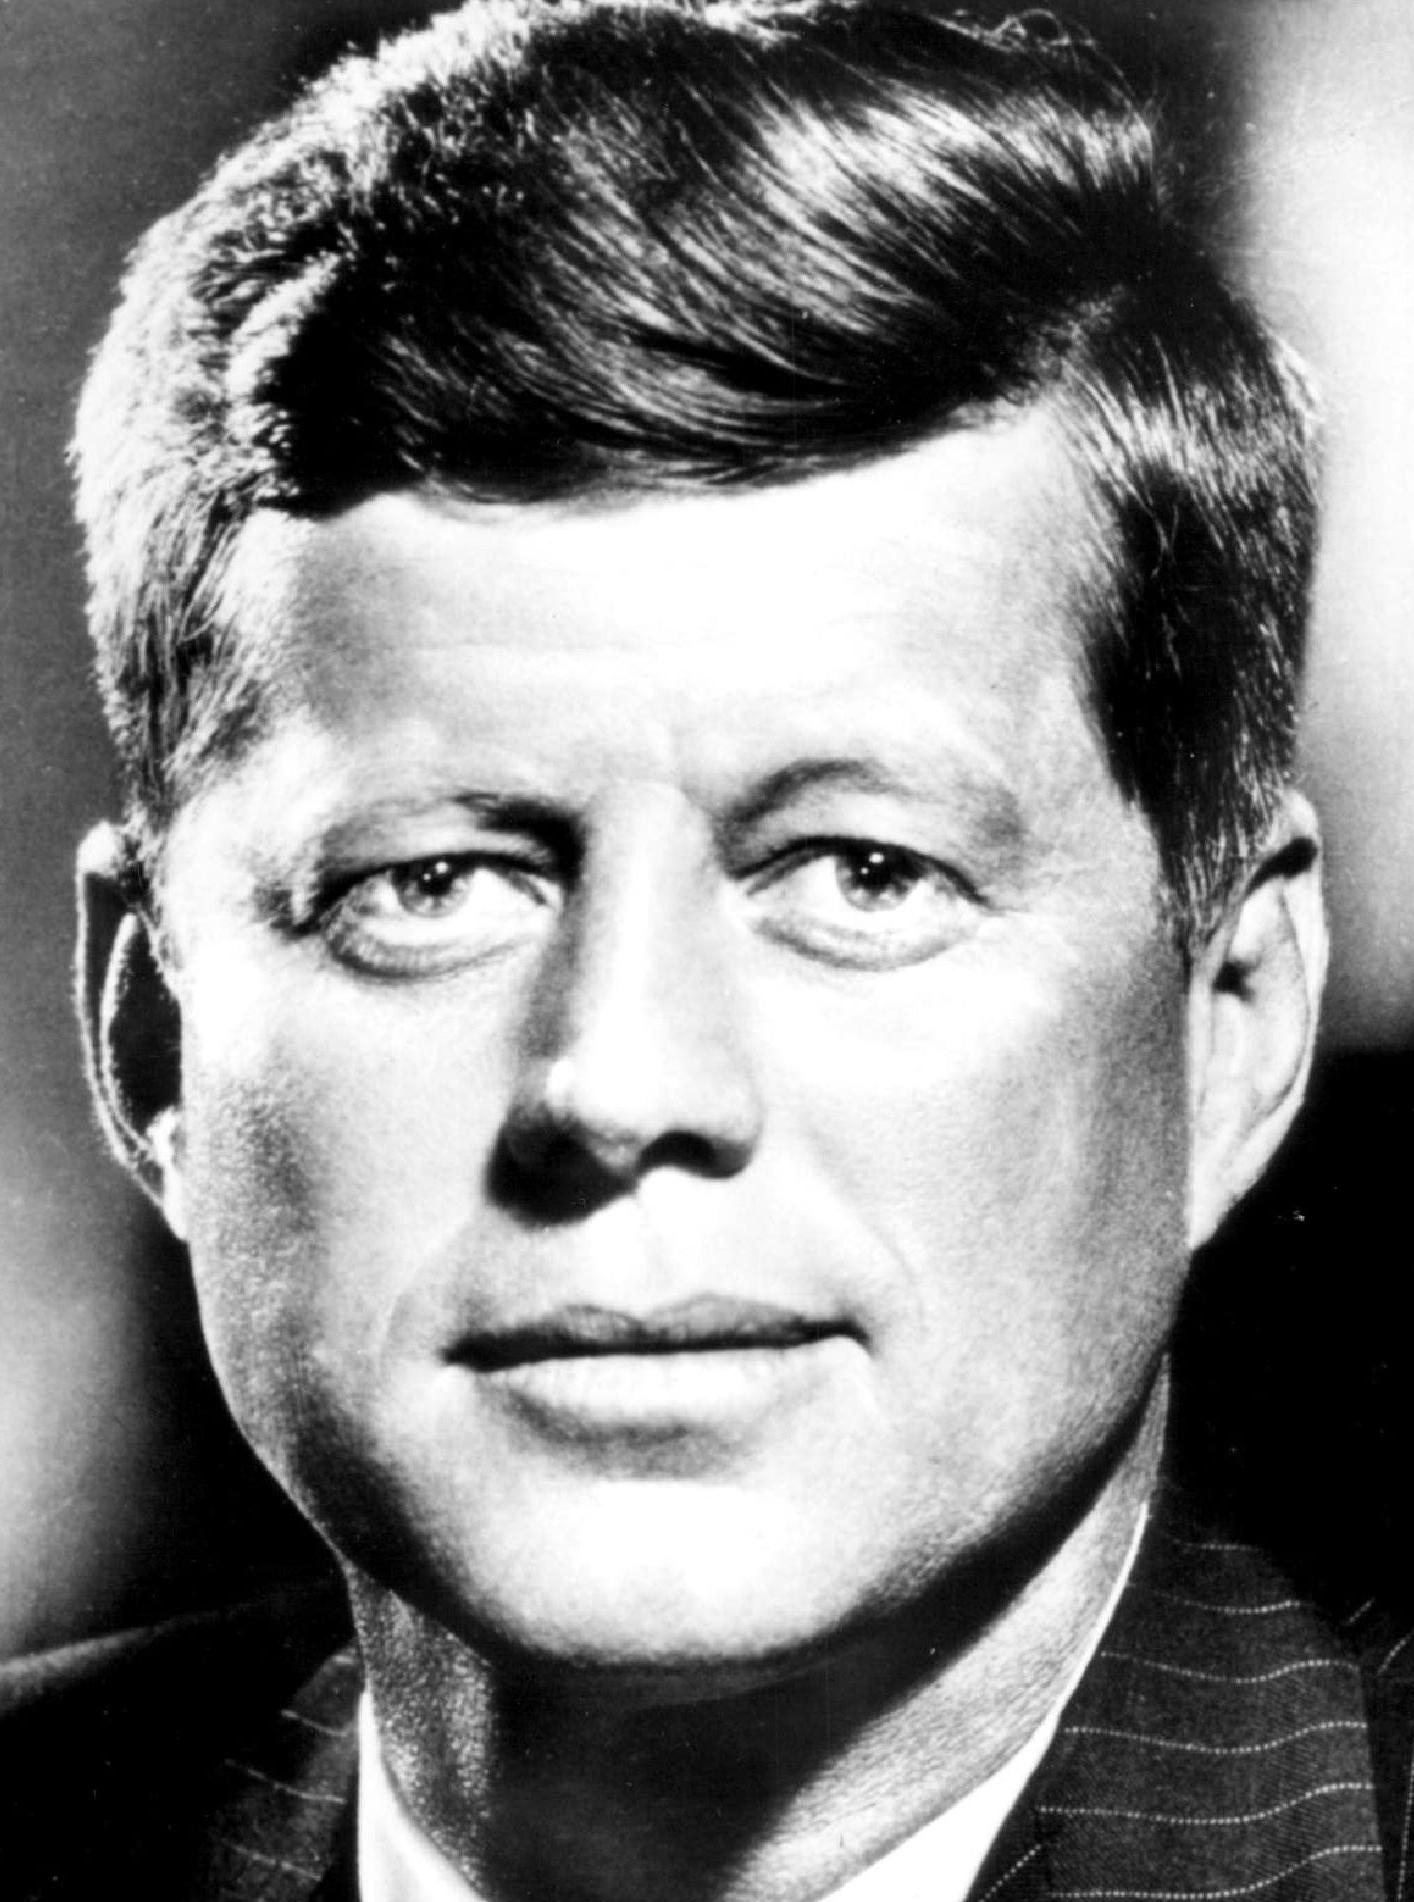 President John F. Kennedy Assassinated in Dallas